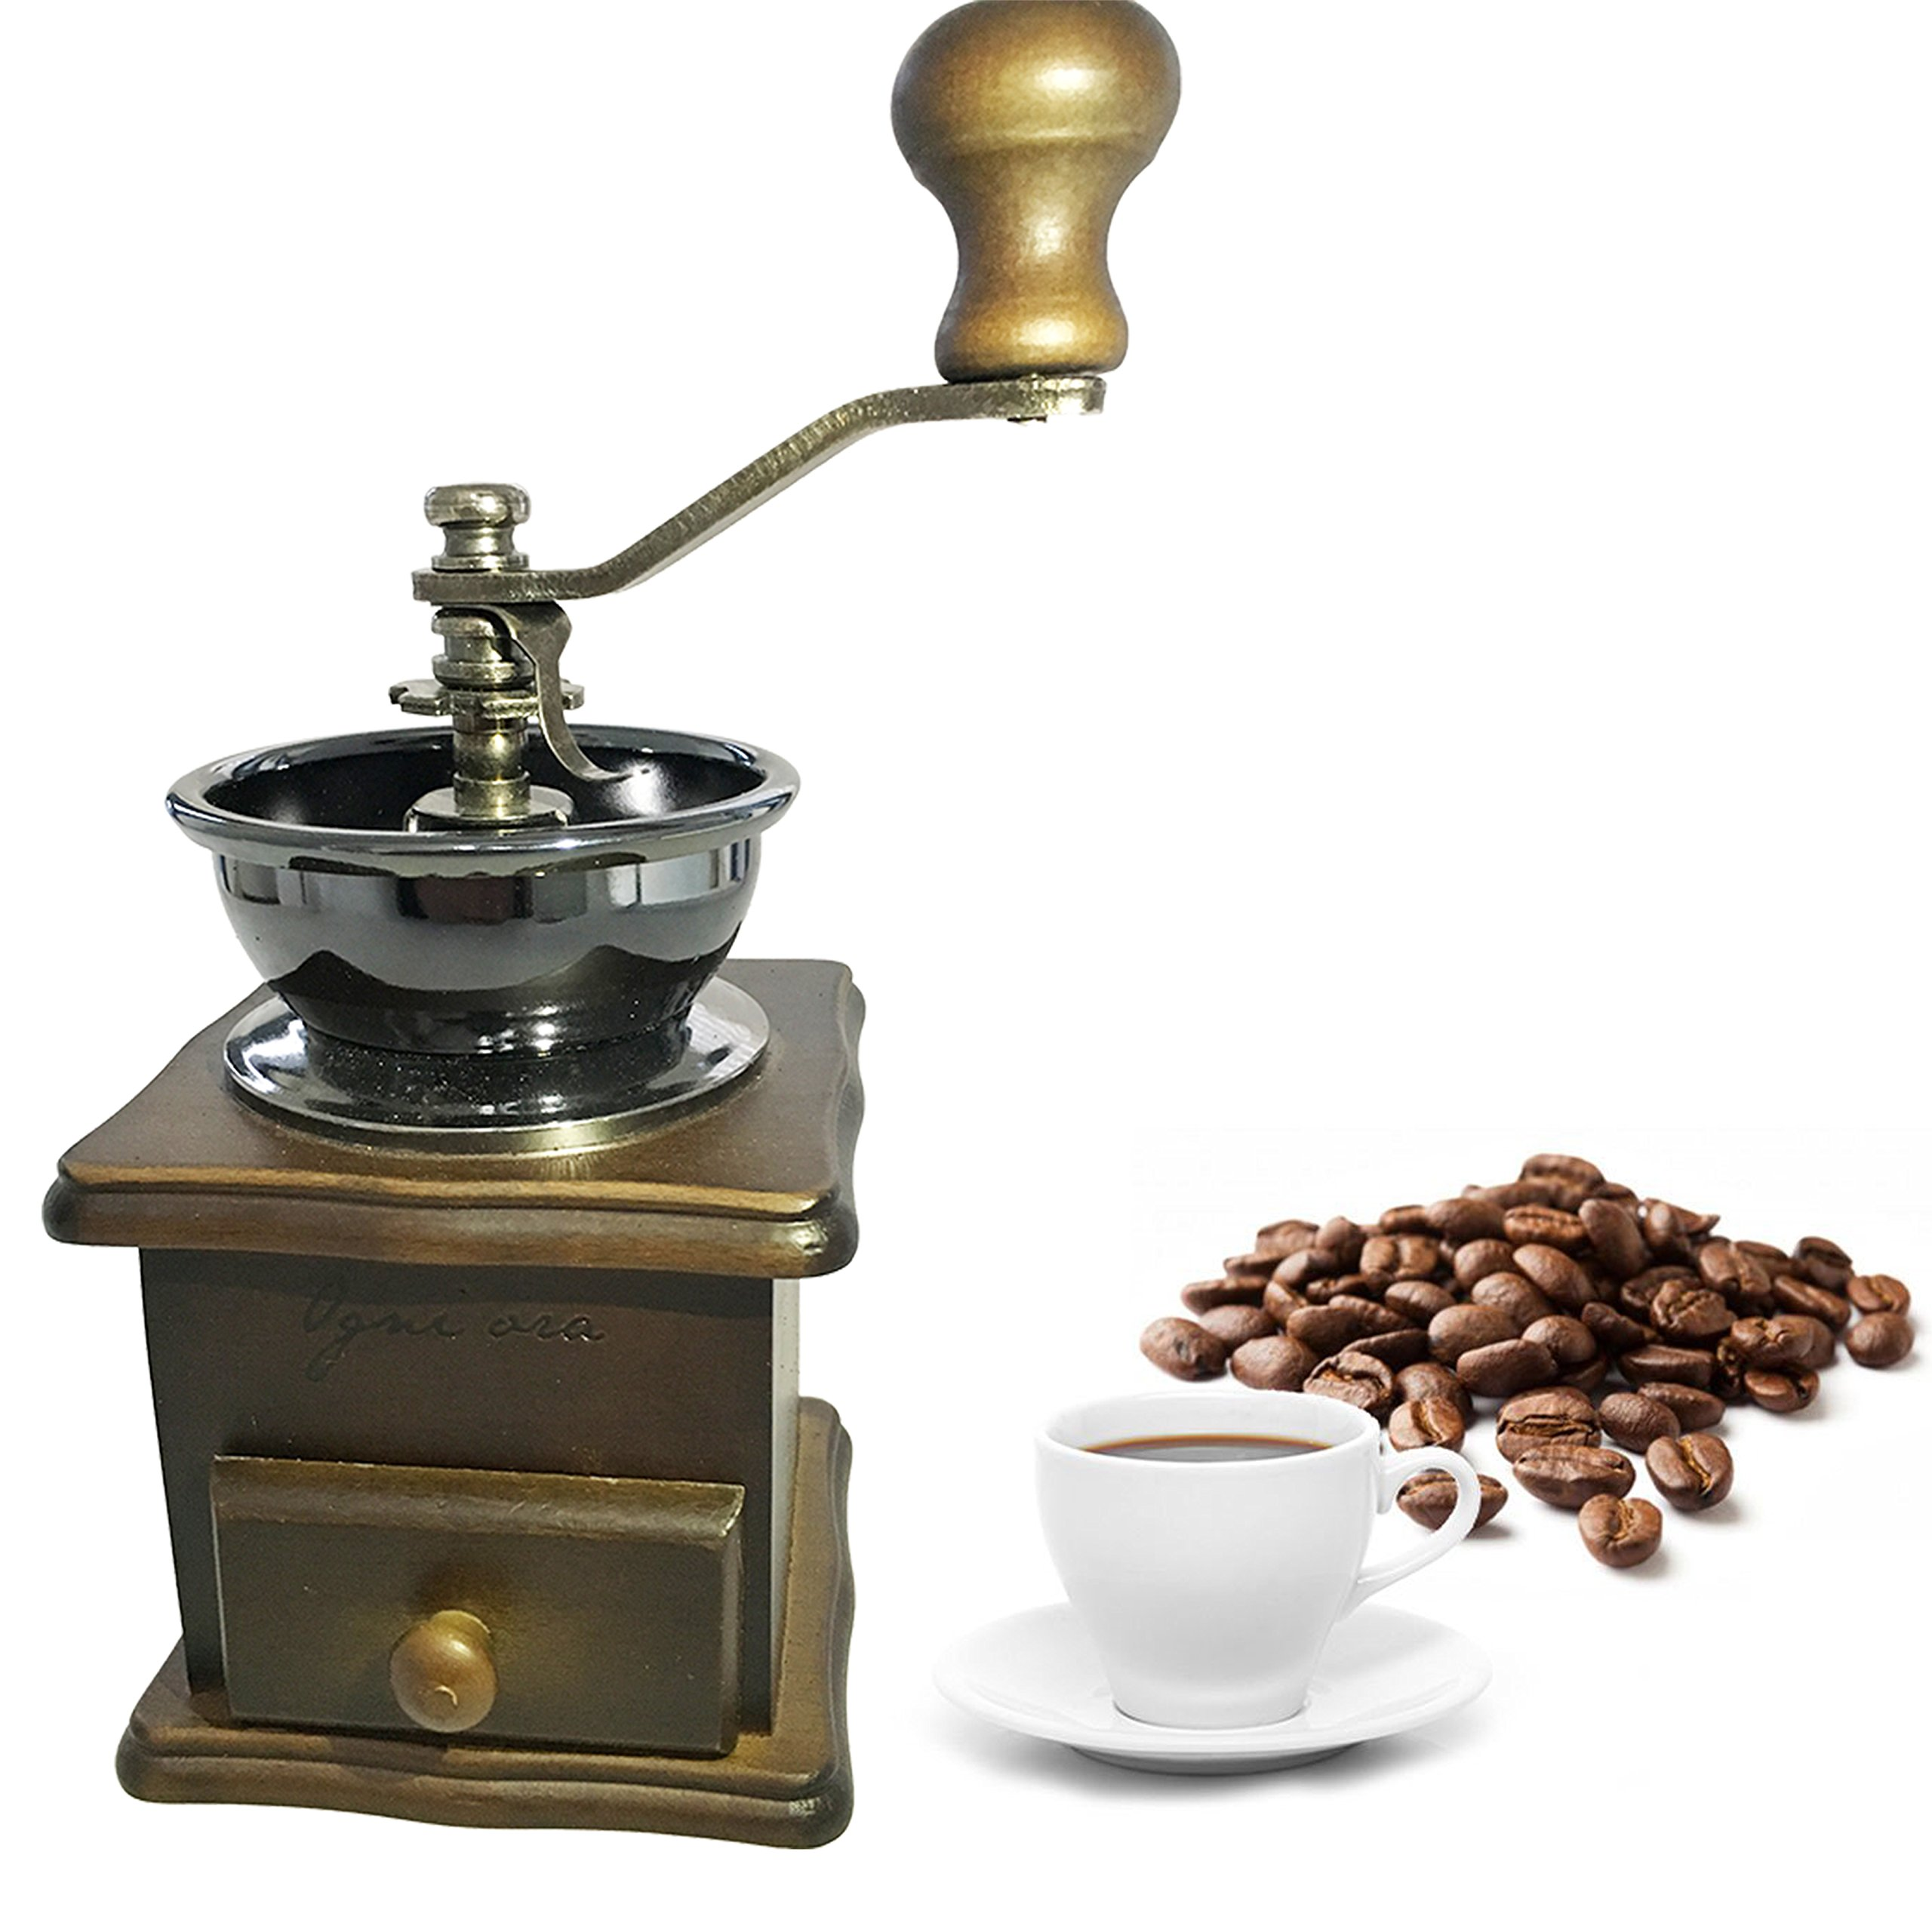 premium adorable manual hand coffee bean grinder of solid. Black Bedroom Furniture Sets. Home Design Ideas